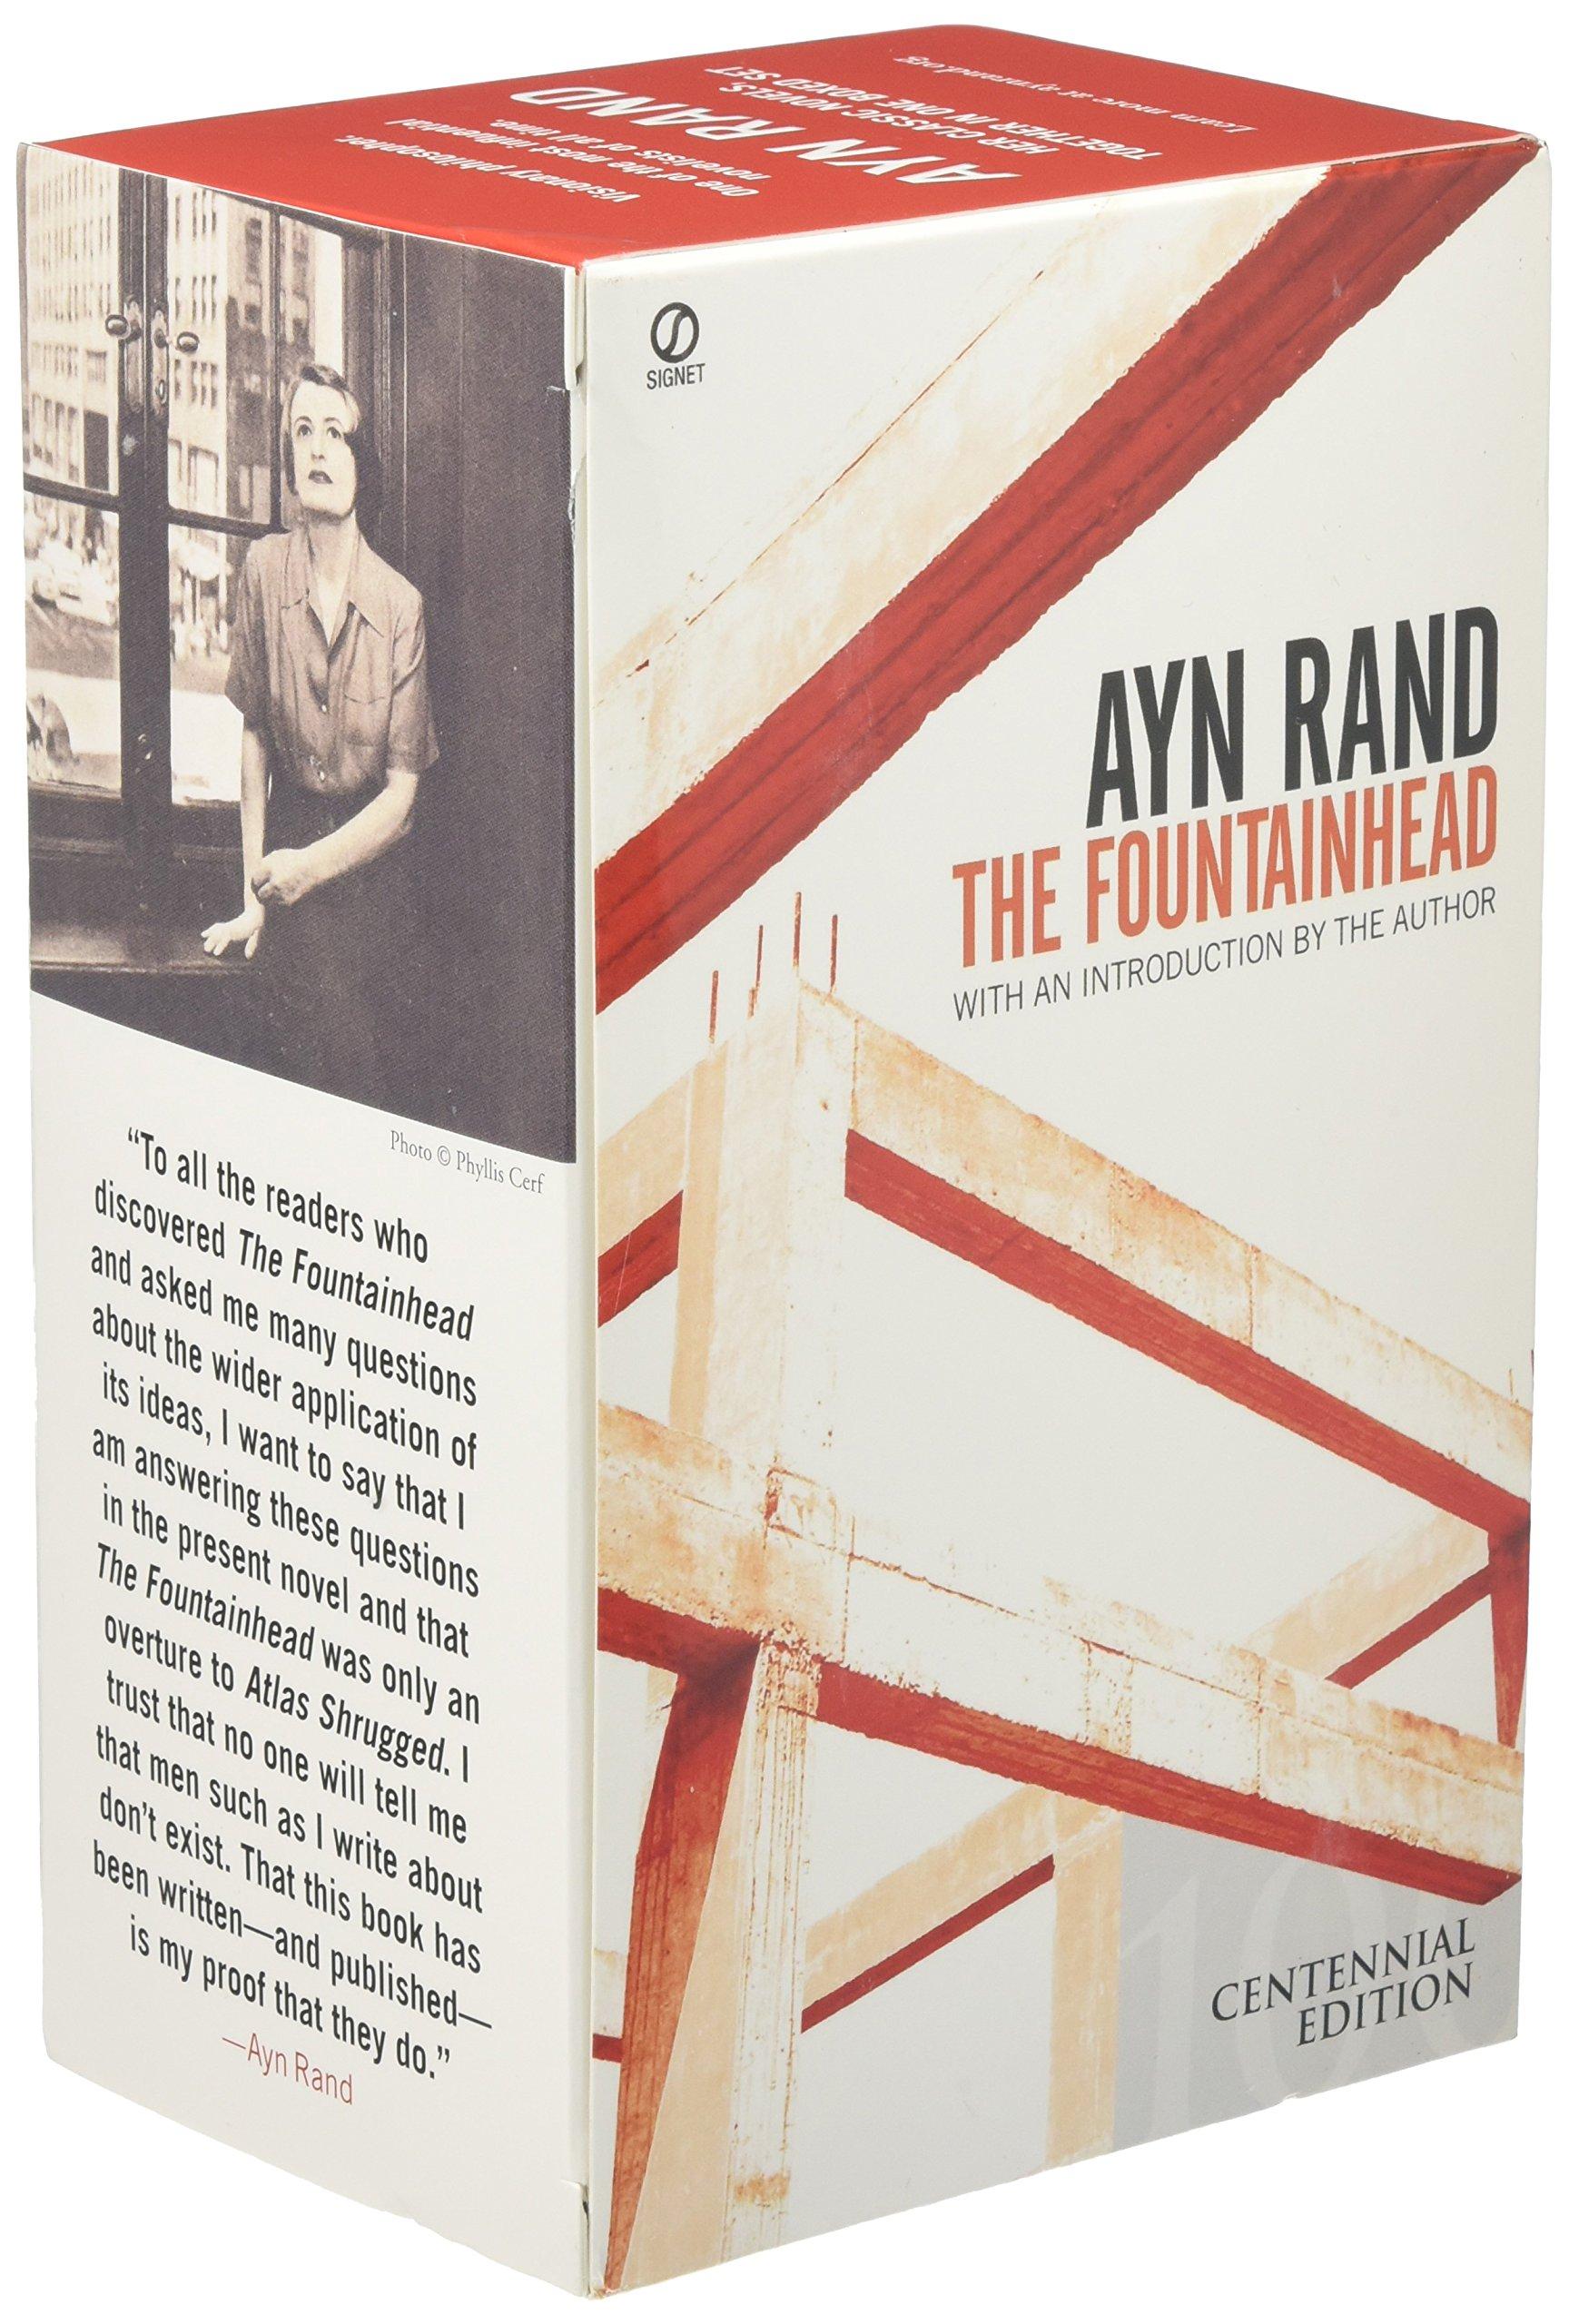 ayn rand fountainhead pdf free download